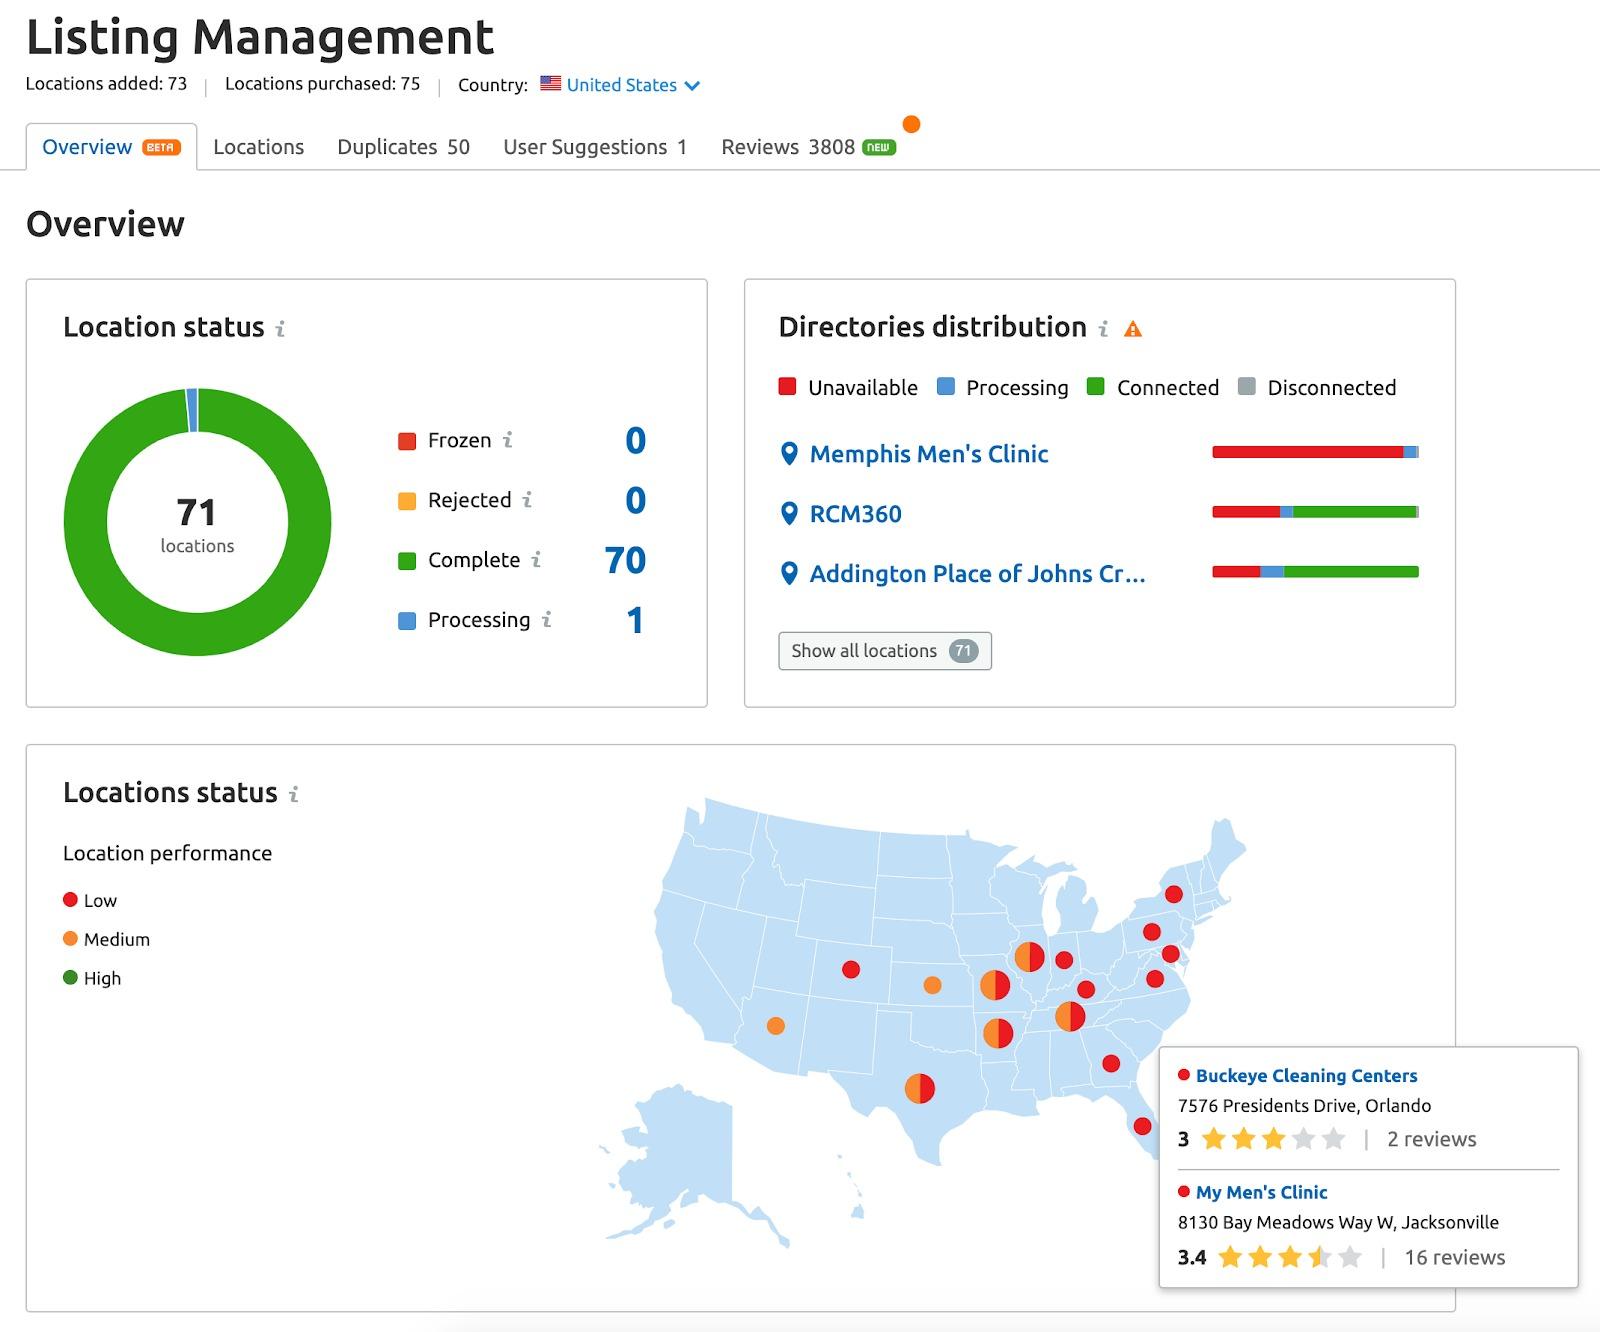 Listing Management image 2